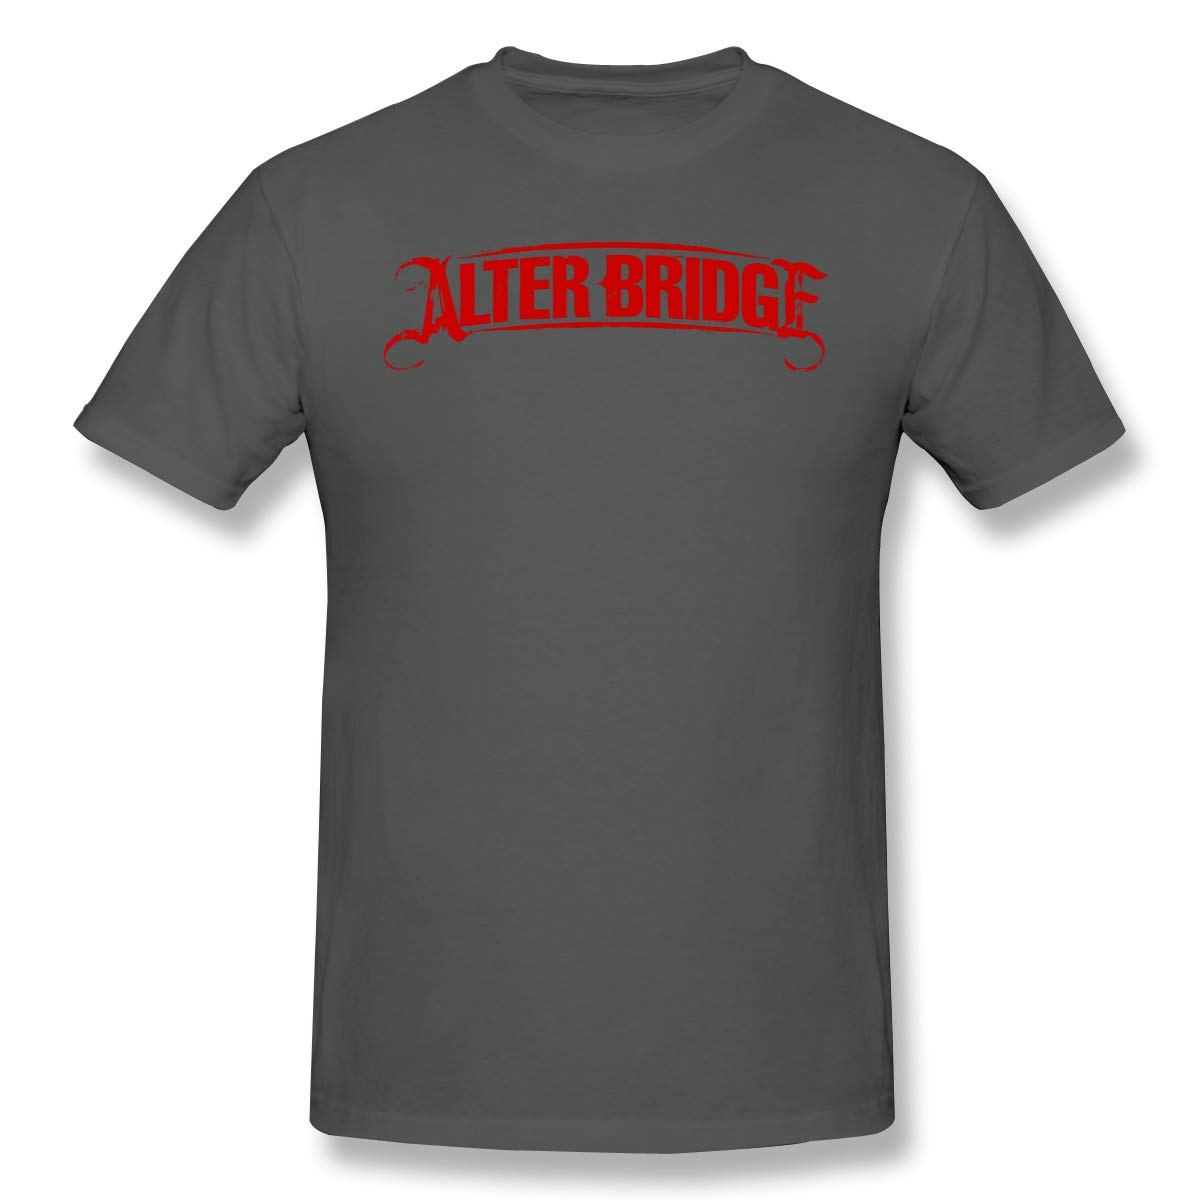 Pinnuoxieye Alter Bridge Men's Fashion Short Sleeve Deep Heather Shirts